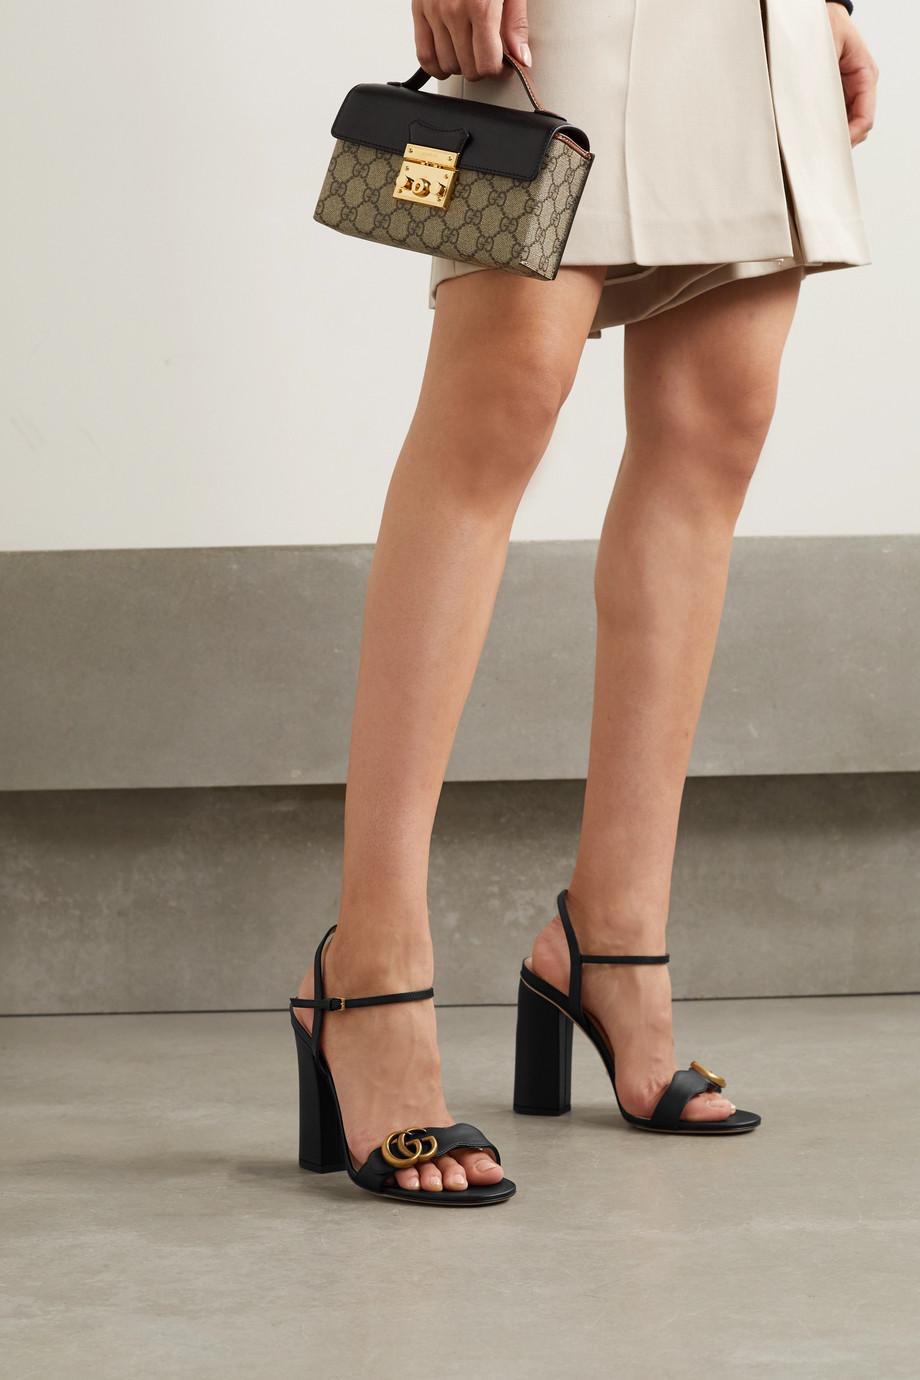 Gucci Marmont Sandalen aus Leder mit Logoverzierung